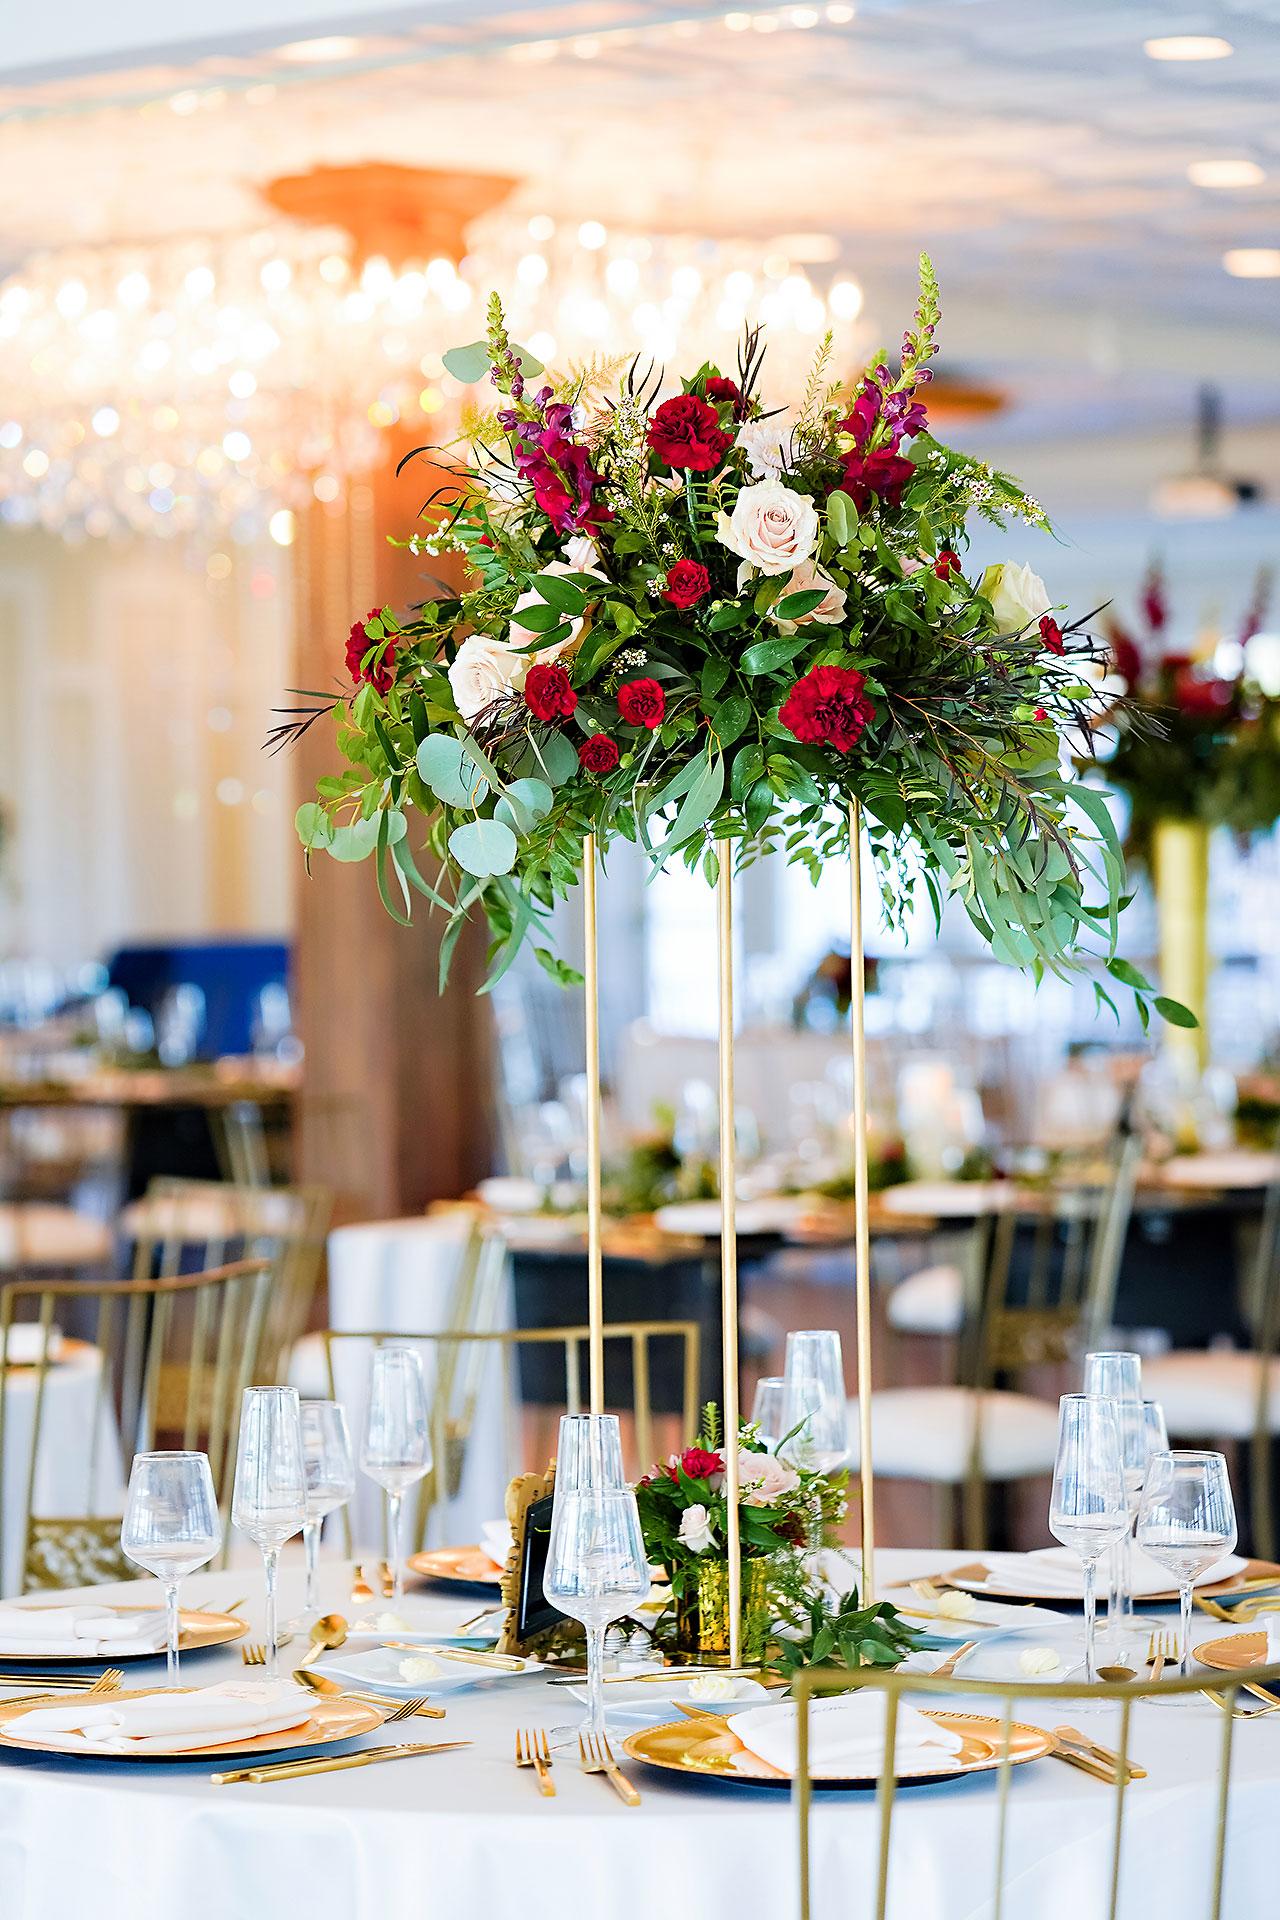 Nadia Parker Black Iris Estate Carmel Indiana Wedding May 2021 221